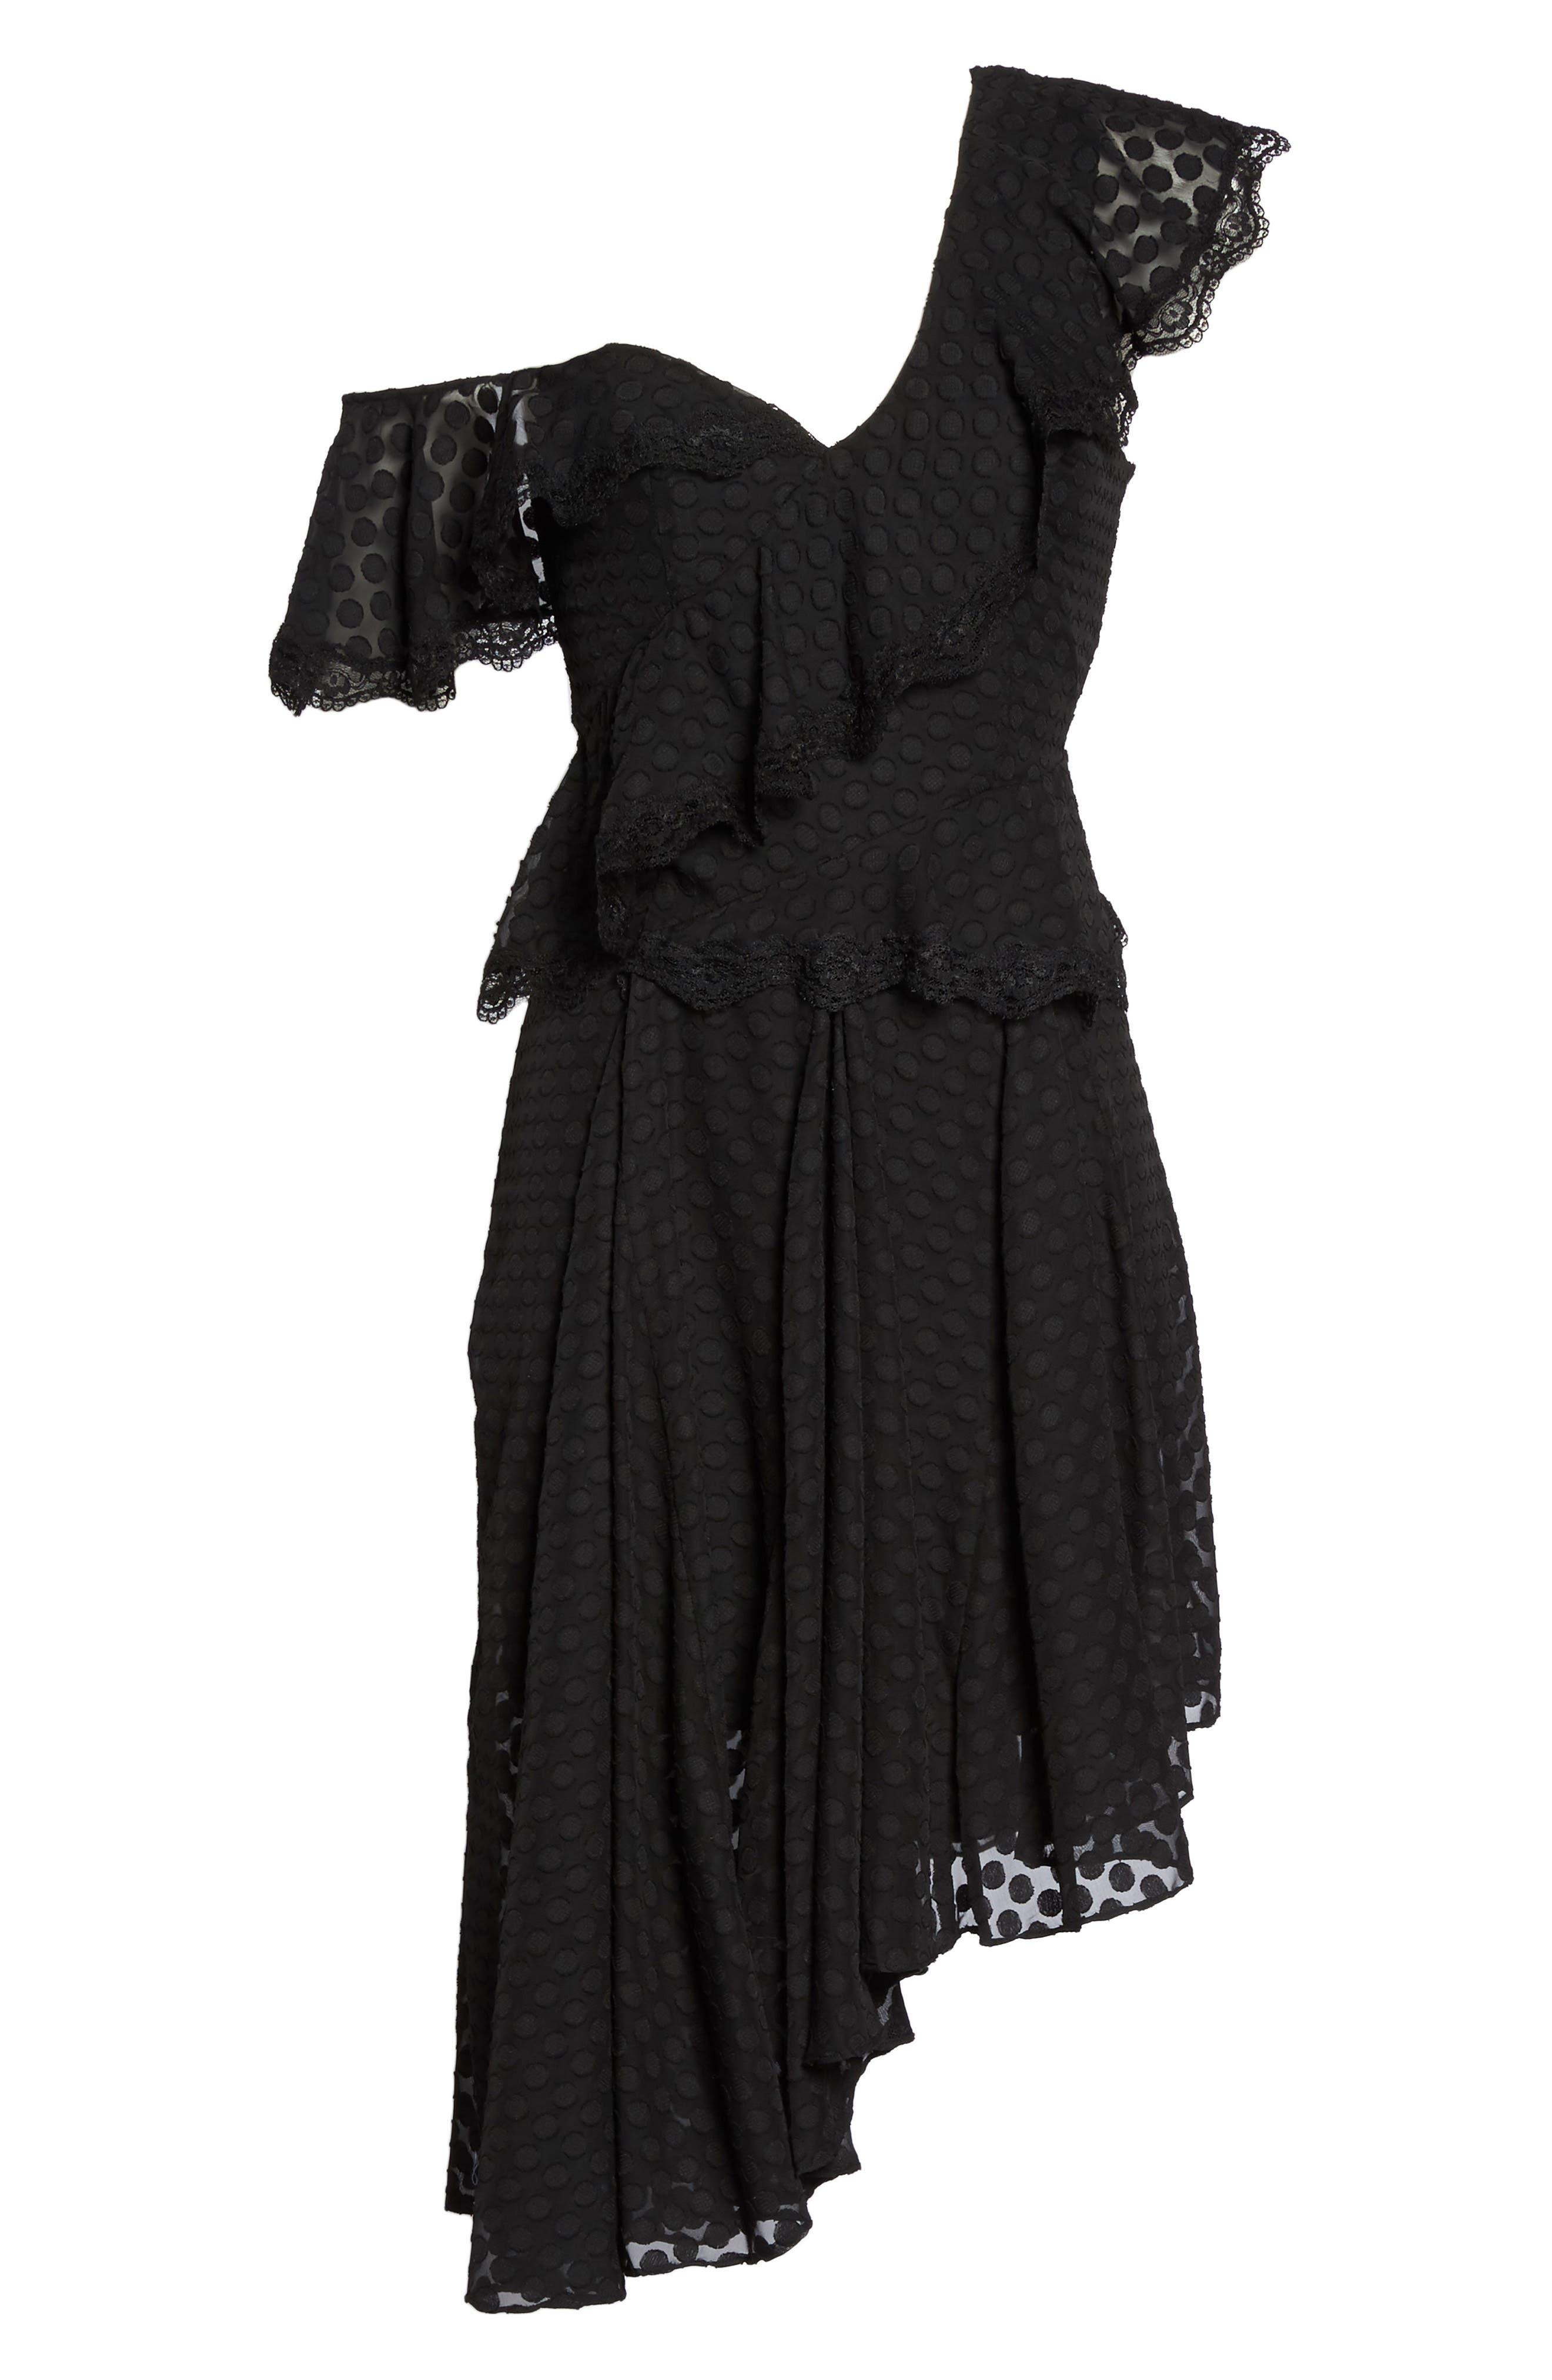 Señorita One-Shoulder Dot Chiffon Dress,                             Alternate thumbnail 6, color,                             001